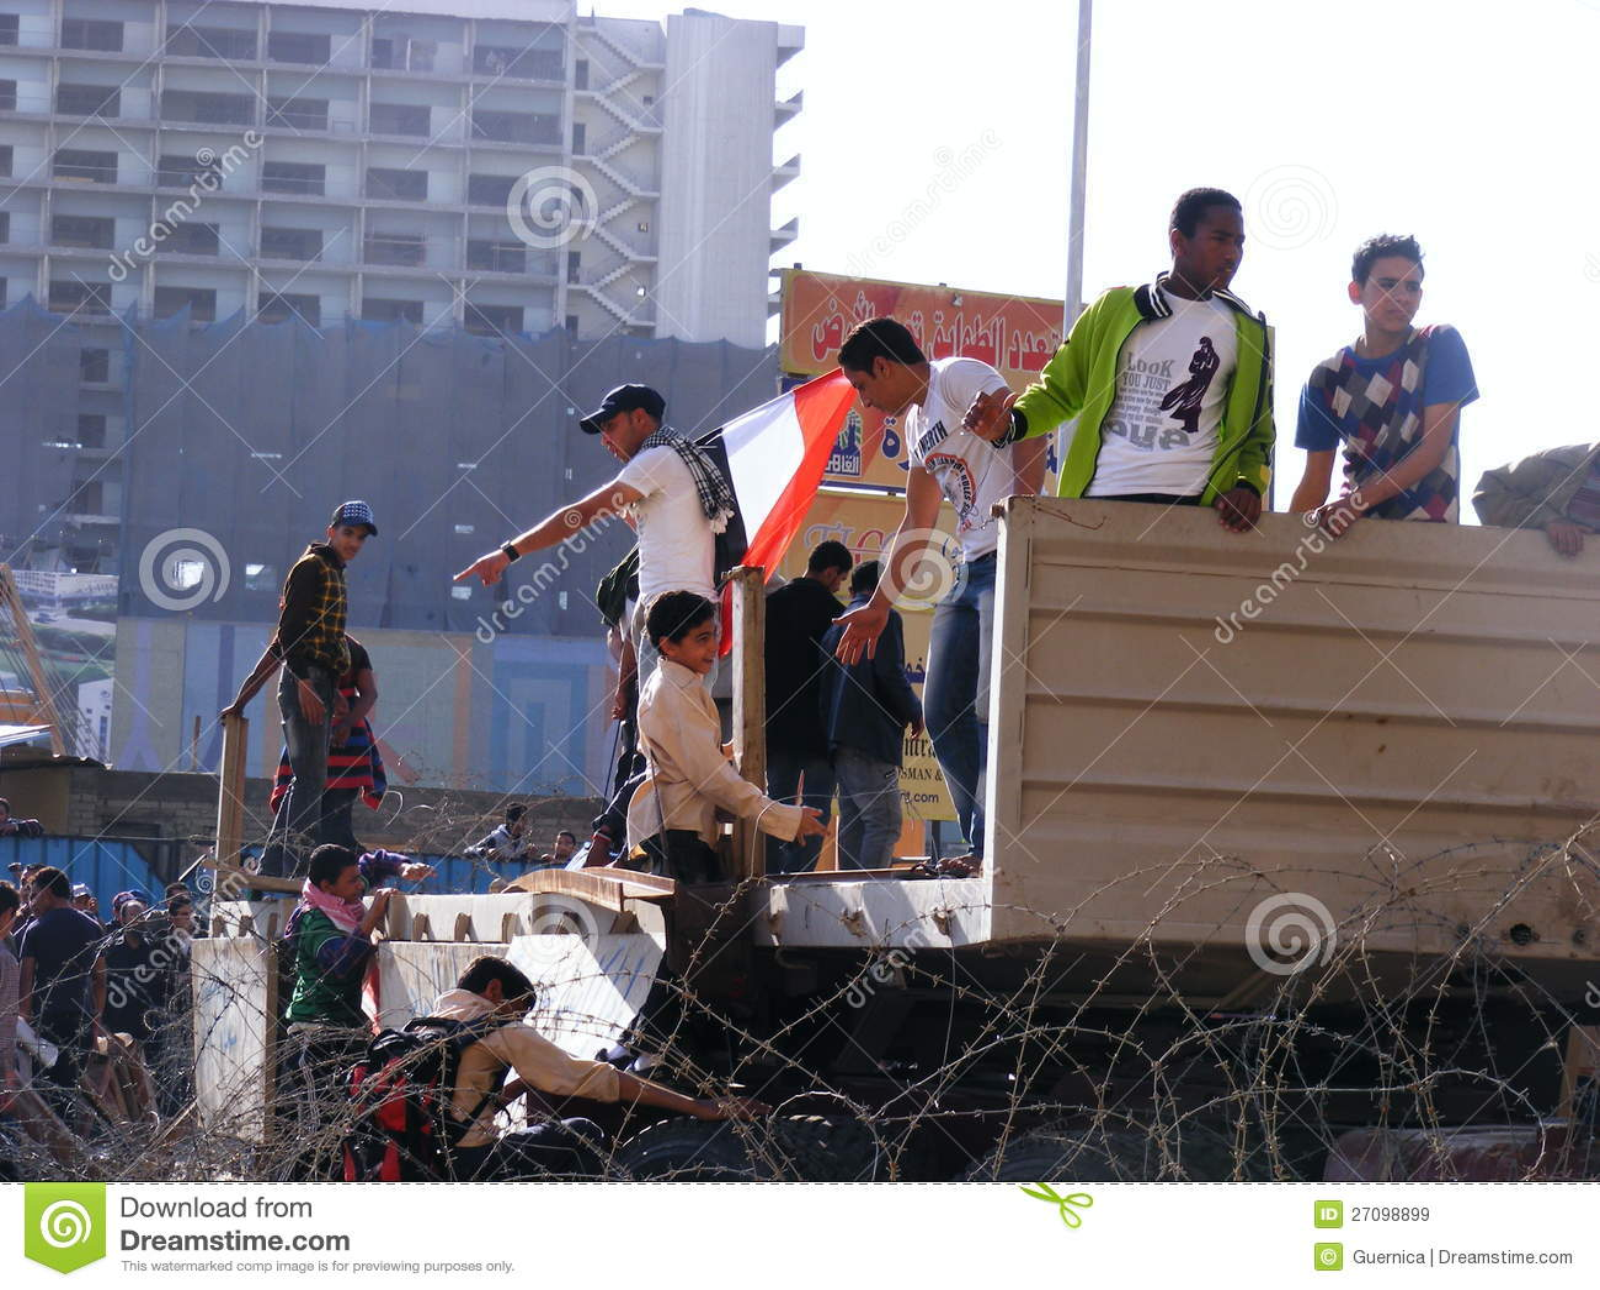 People gathering in Tahrir Square